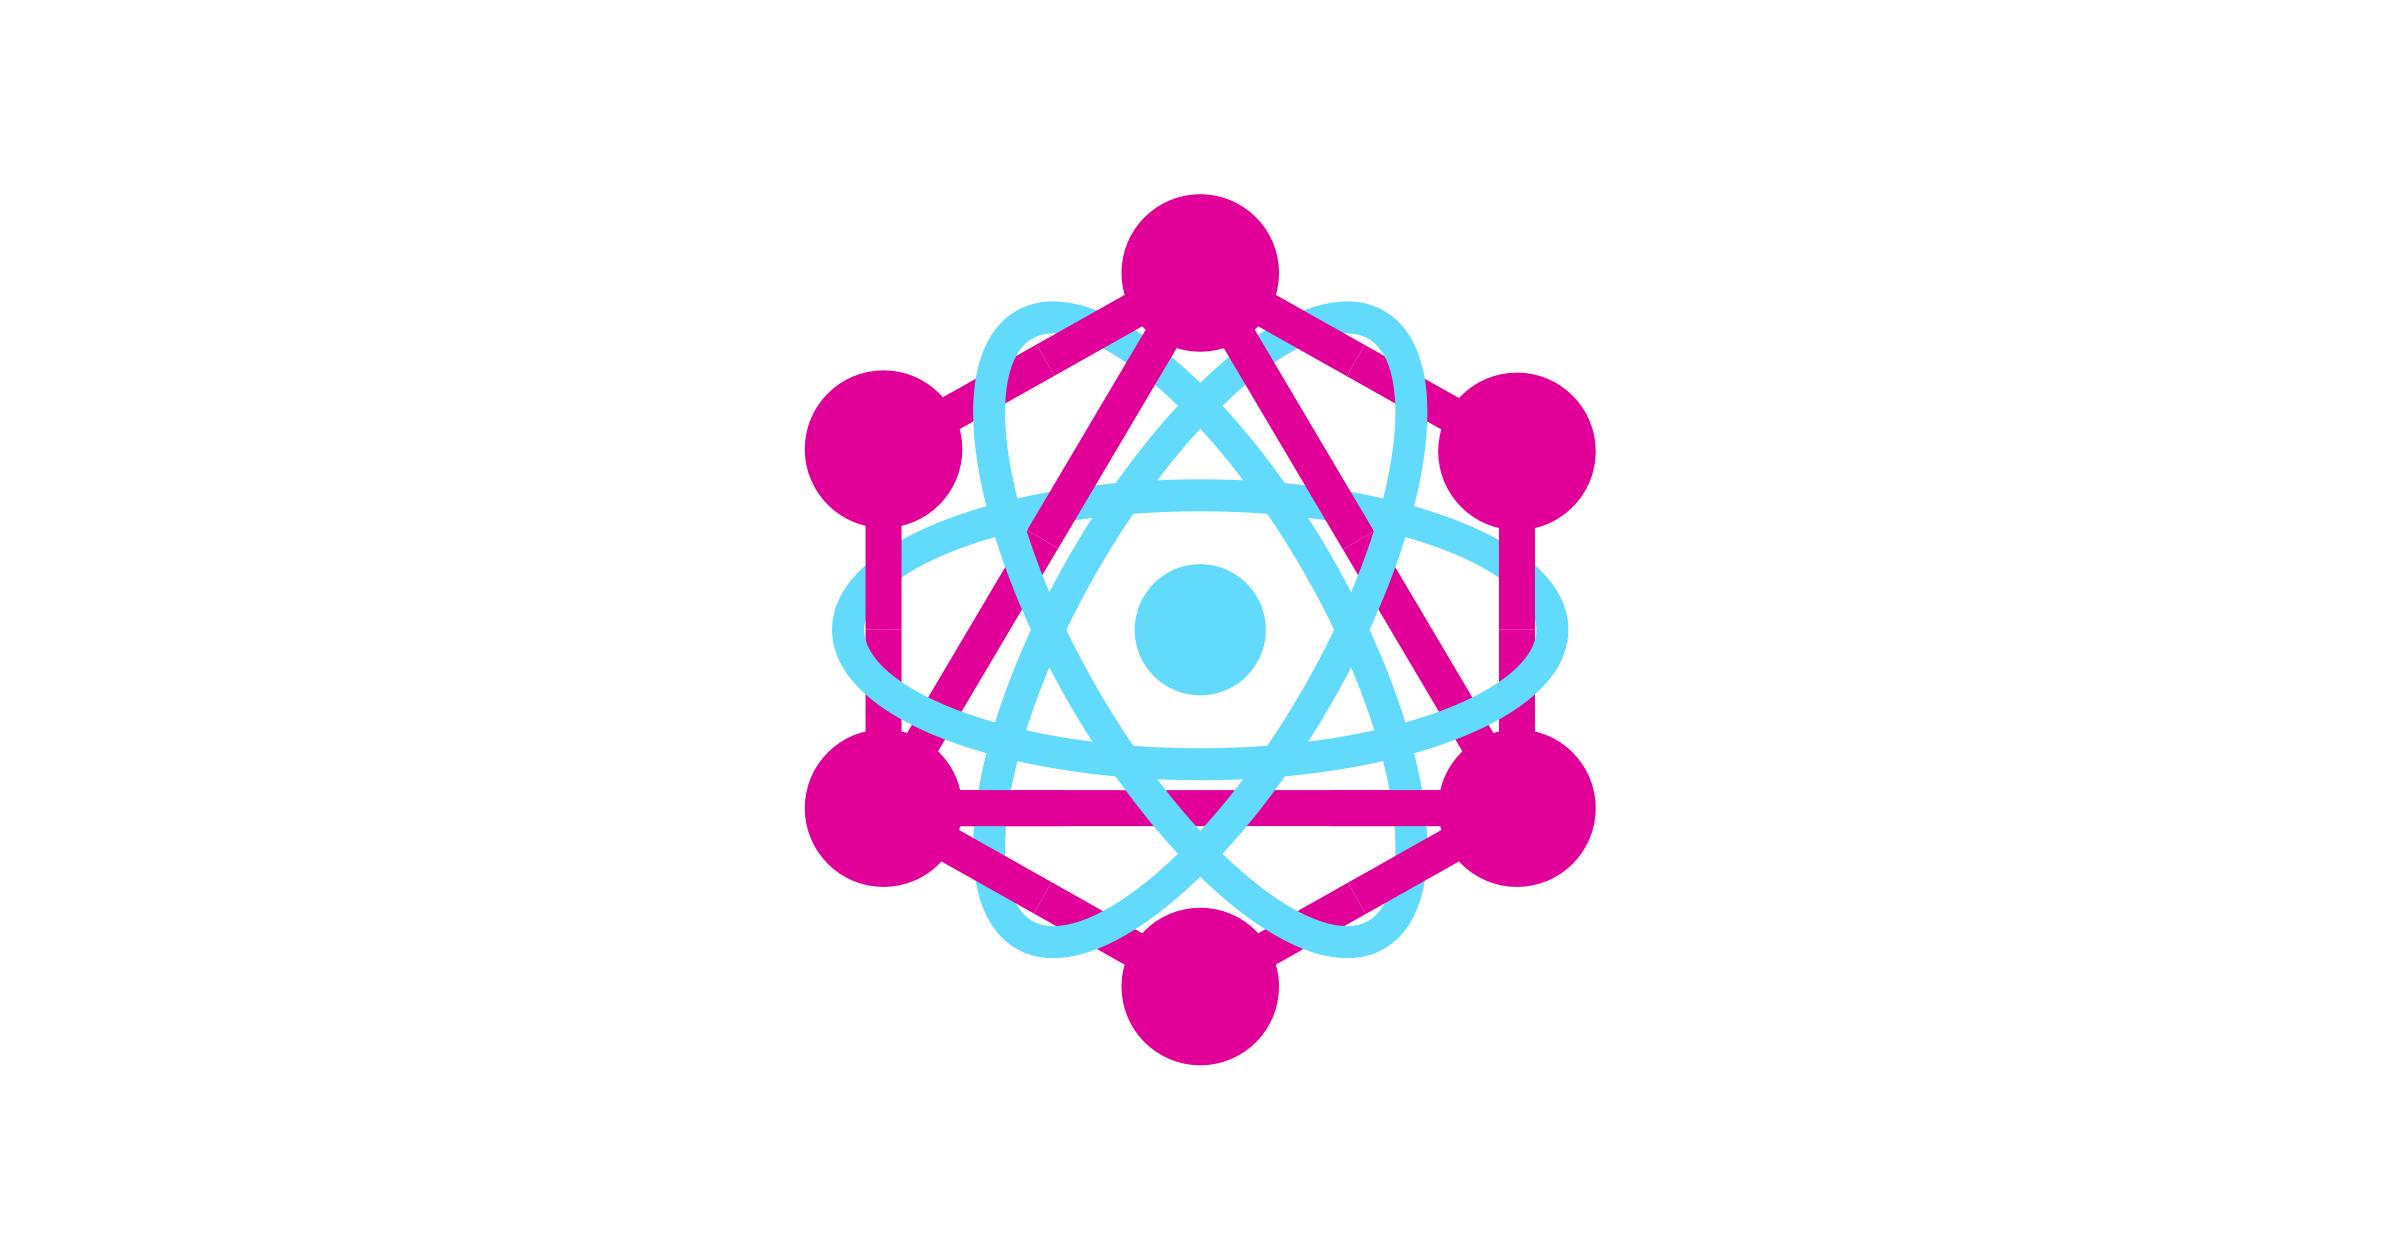 jaydenseric/next-graphql-react GitHub repo thumbnail.